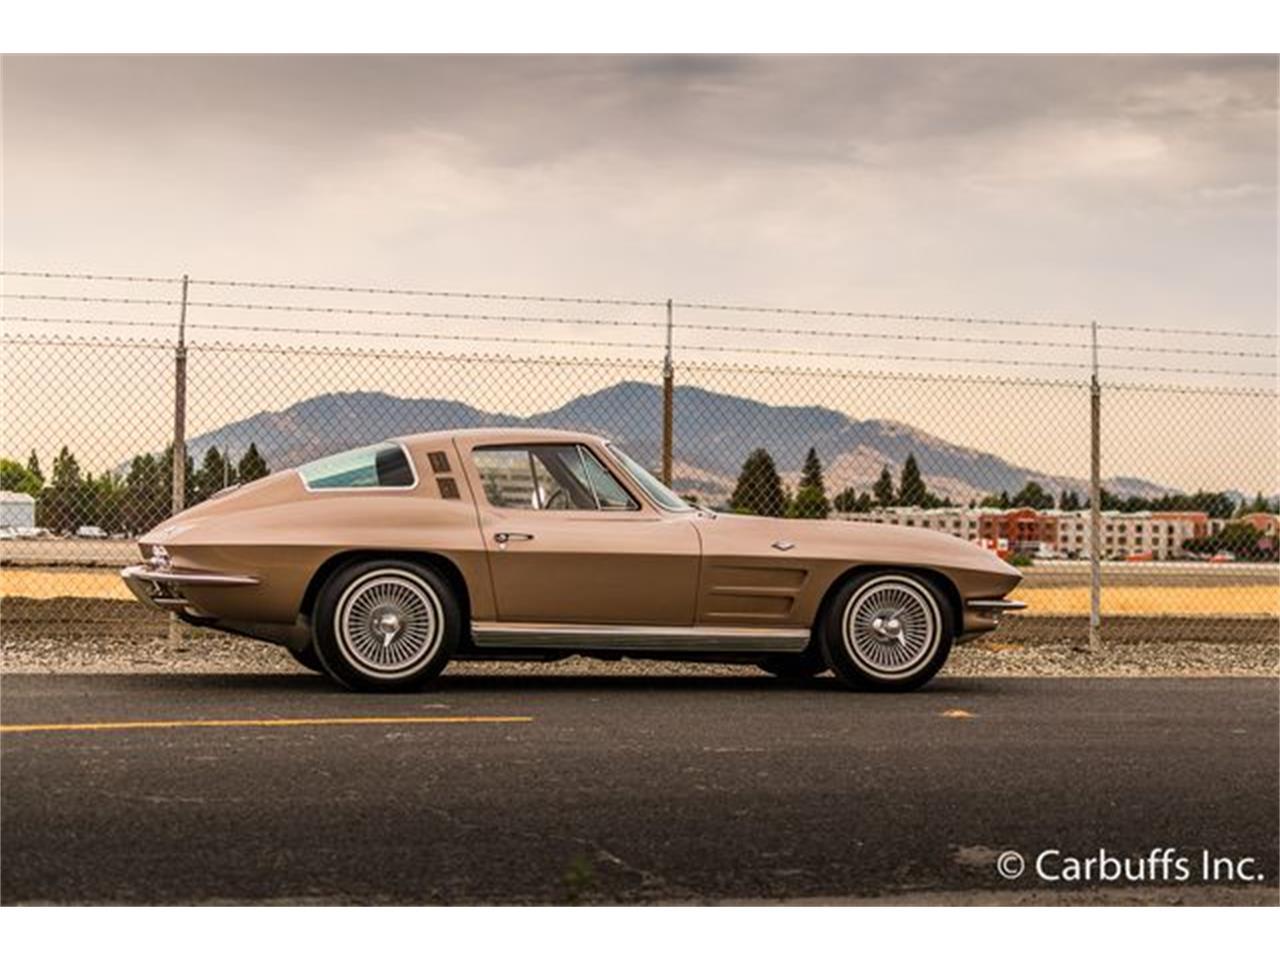 Large Picture of '64 Chevrolet Corvette located in California - $53,950.00 - LSQ2